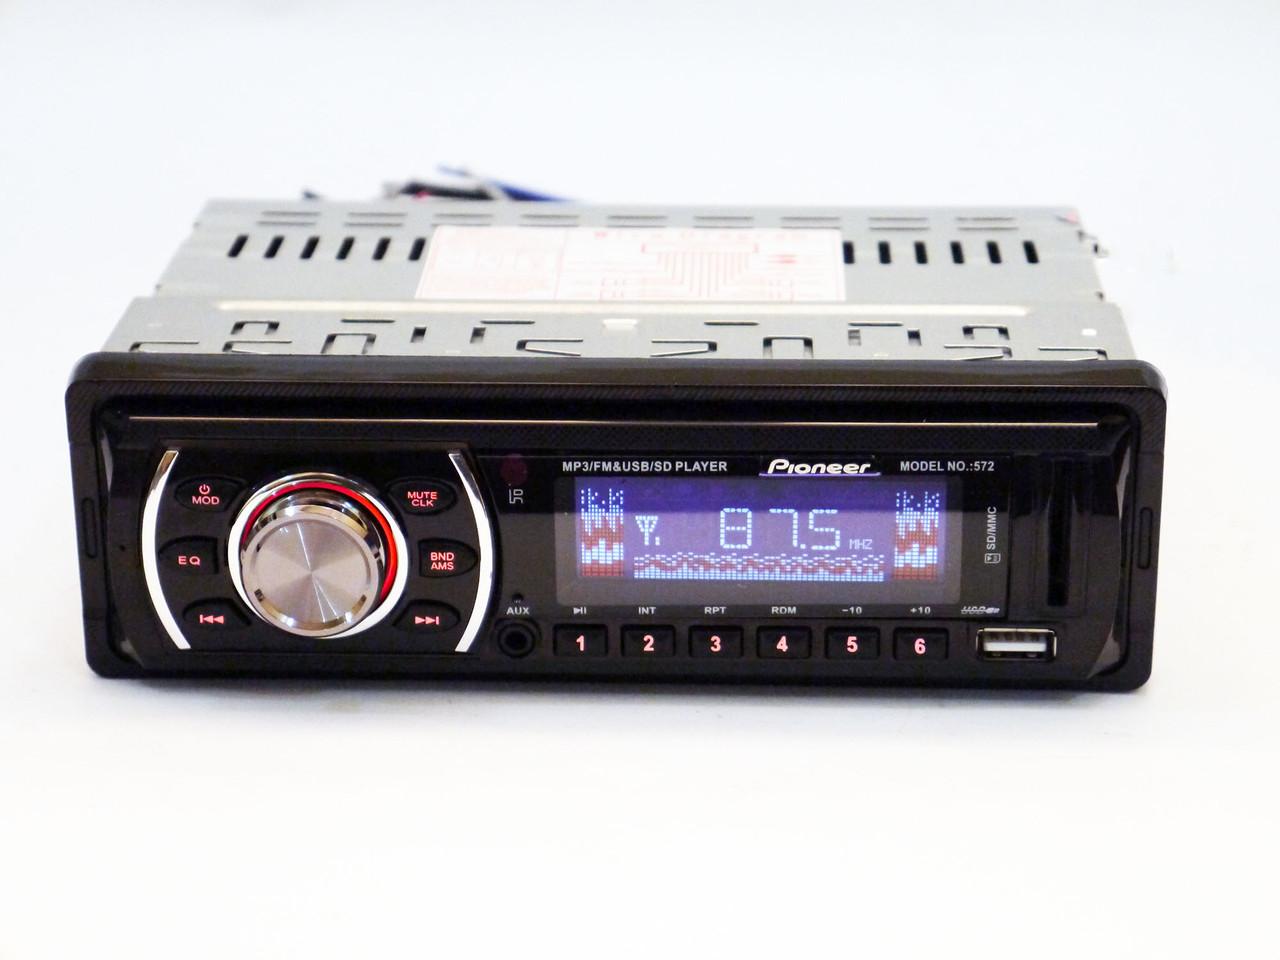 Автомагнитола Pioneer 572 Usb+Sd+Fm+Aux+ пульт